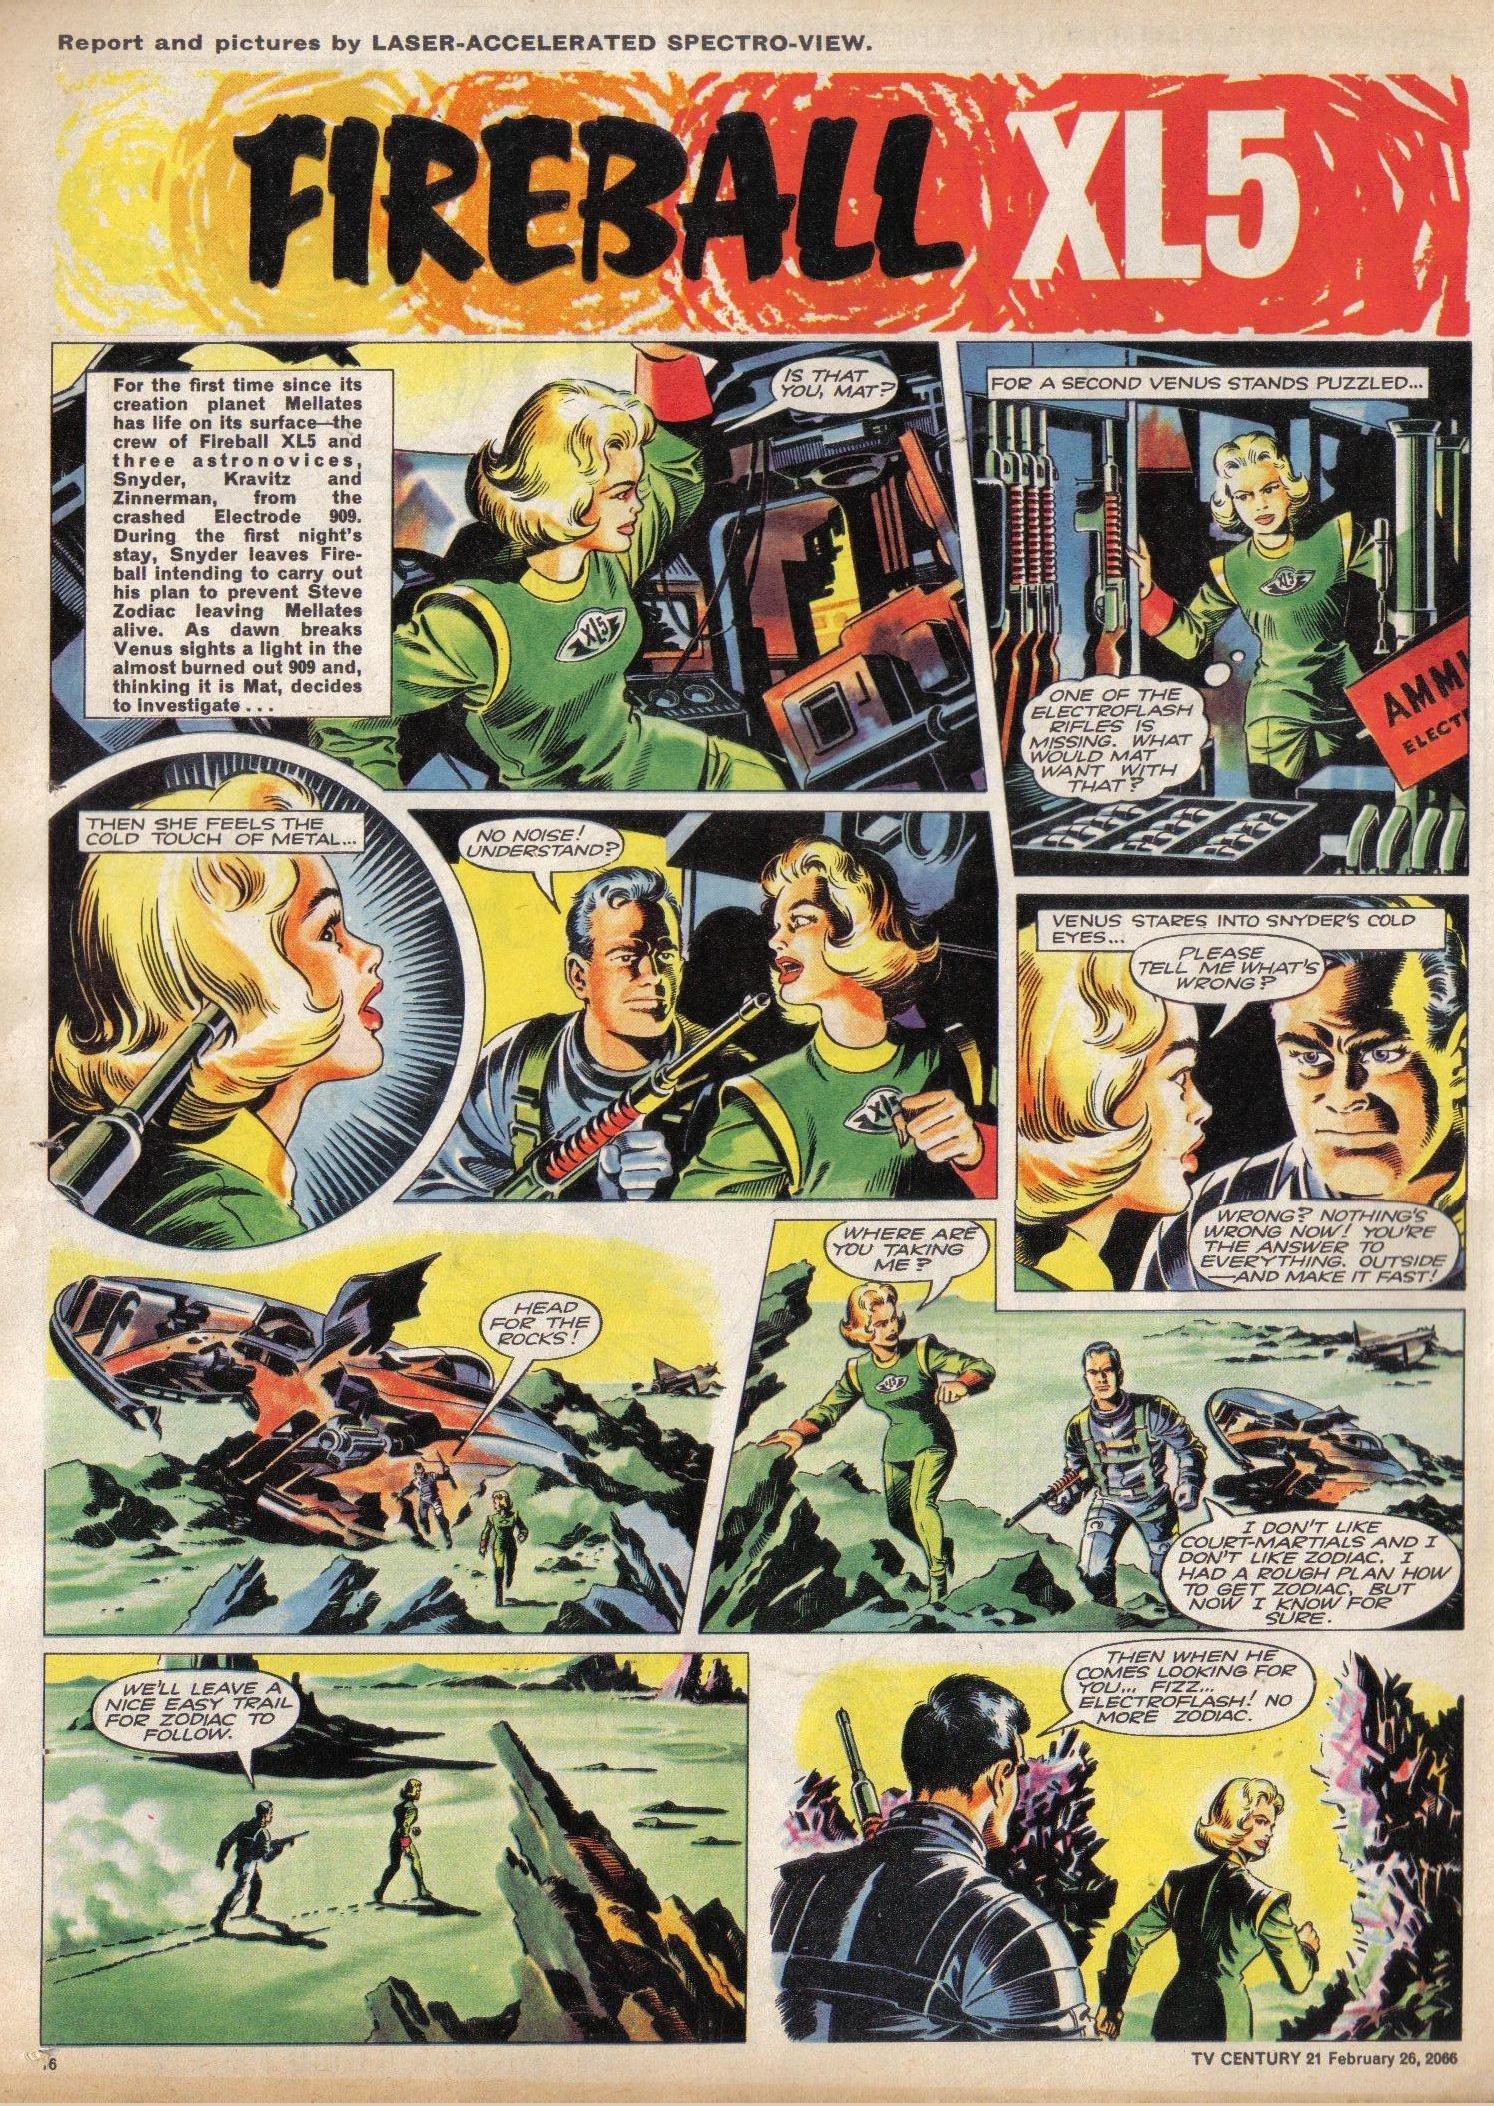 Read online TV Century 21 (TV 21) comic -  Issue #58 - 17